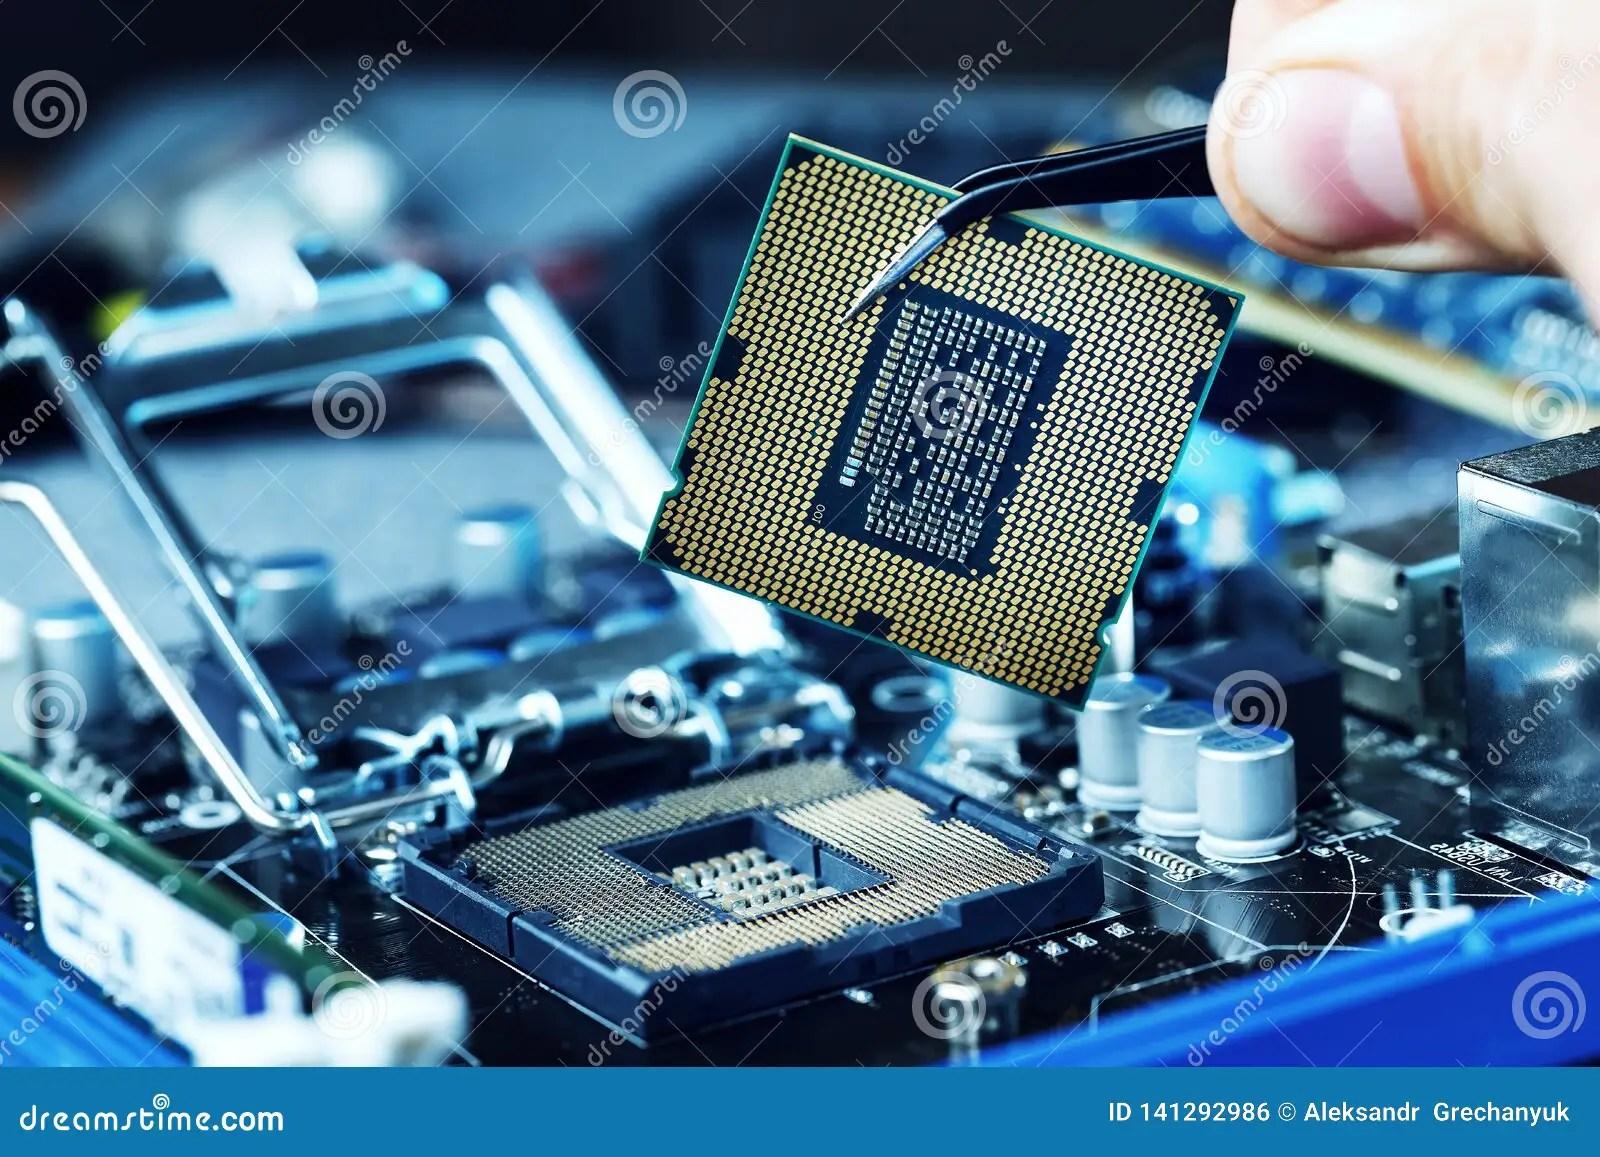 electronic engineer of computer